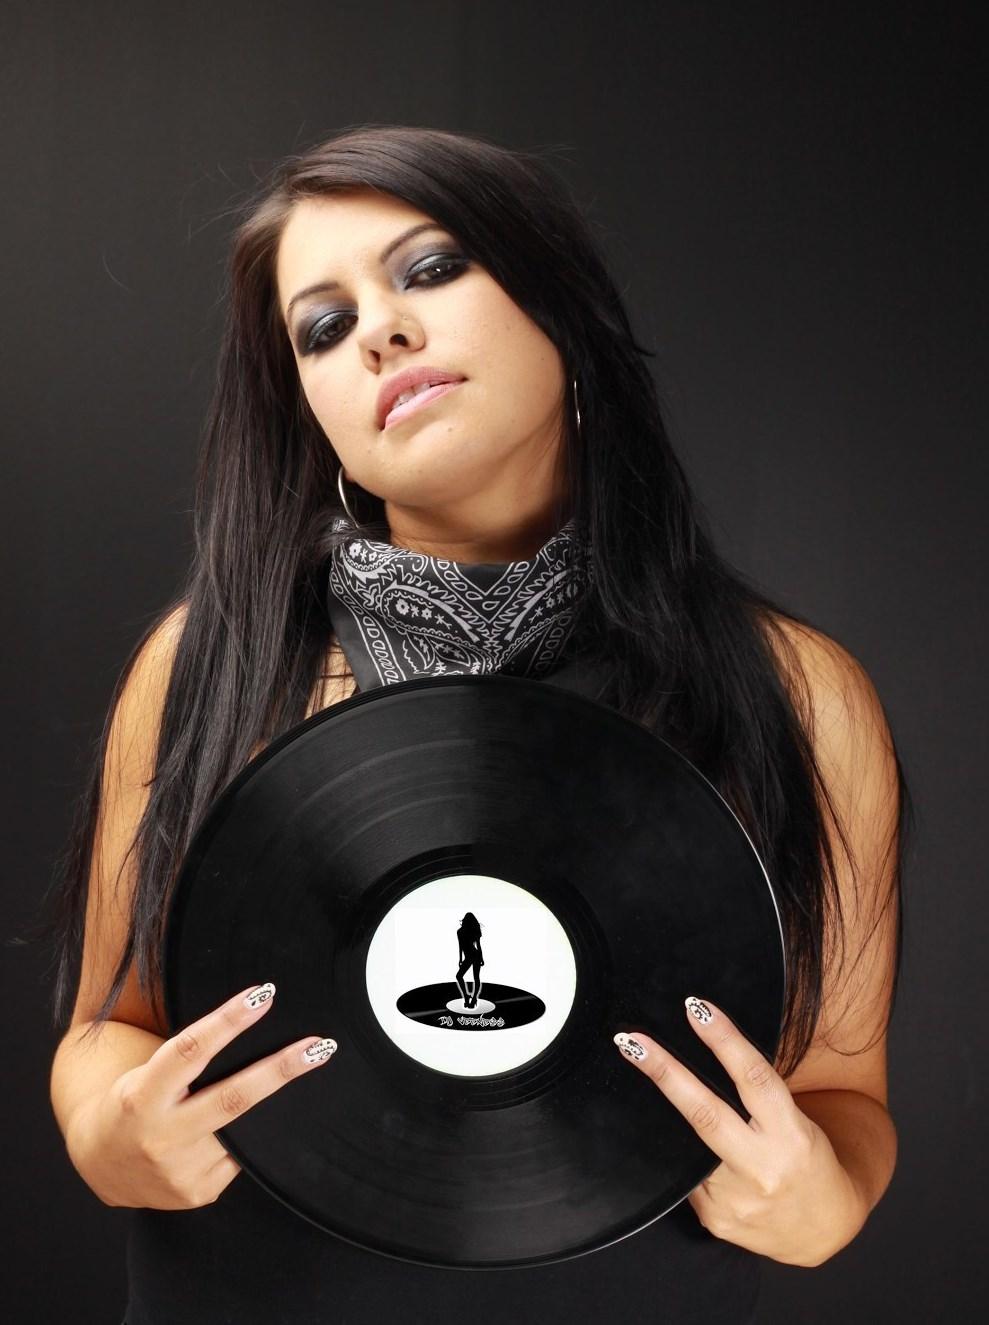 queens of the crossfade australia s female hip hop urban djs howl echoes. Black Bedroom Furniture Sets. Home Design Ideas